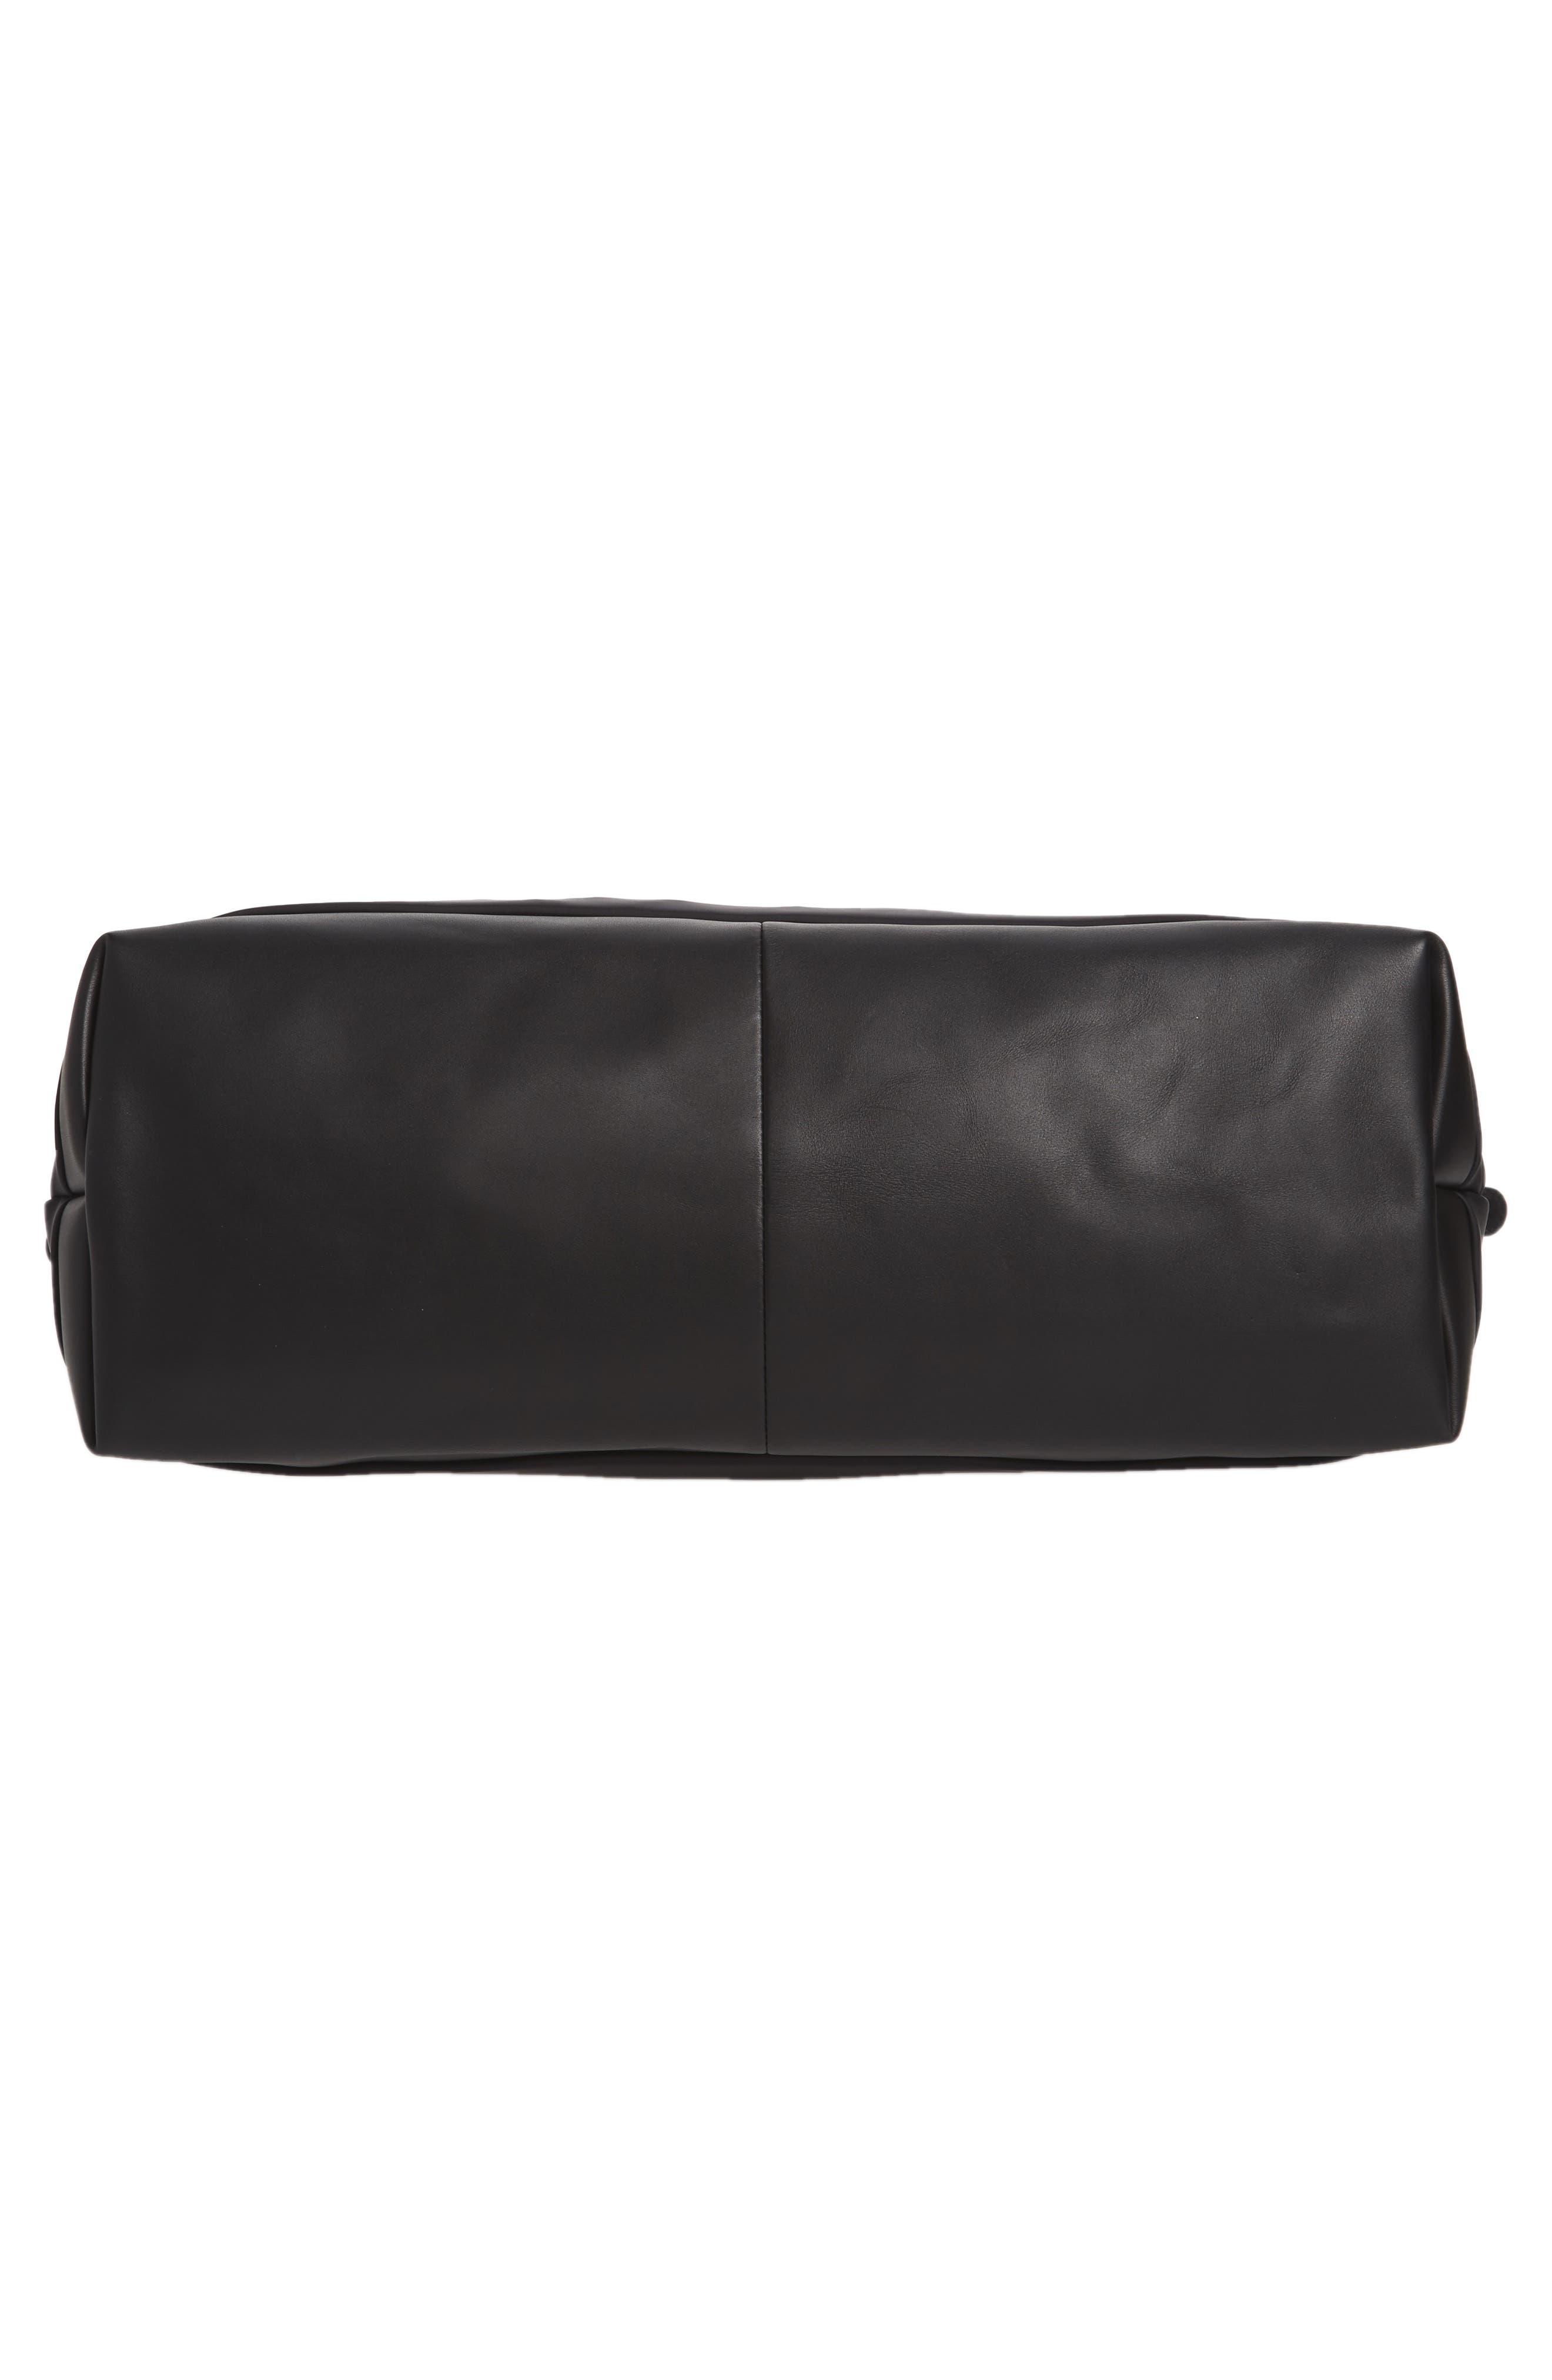 Hartsfield Nylon Tote Bag,                             Alternate thumbnail 6, color,                             001